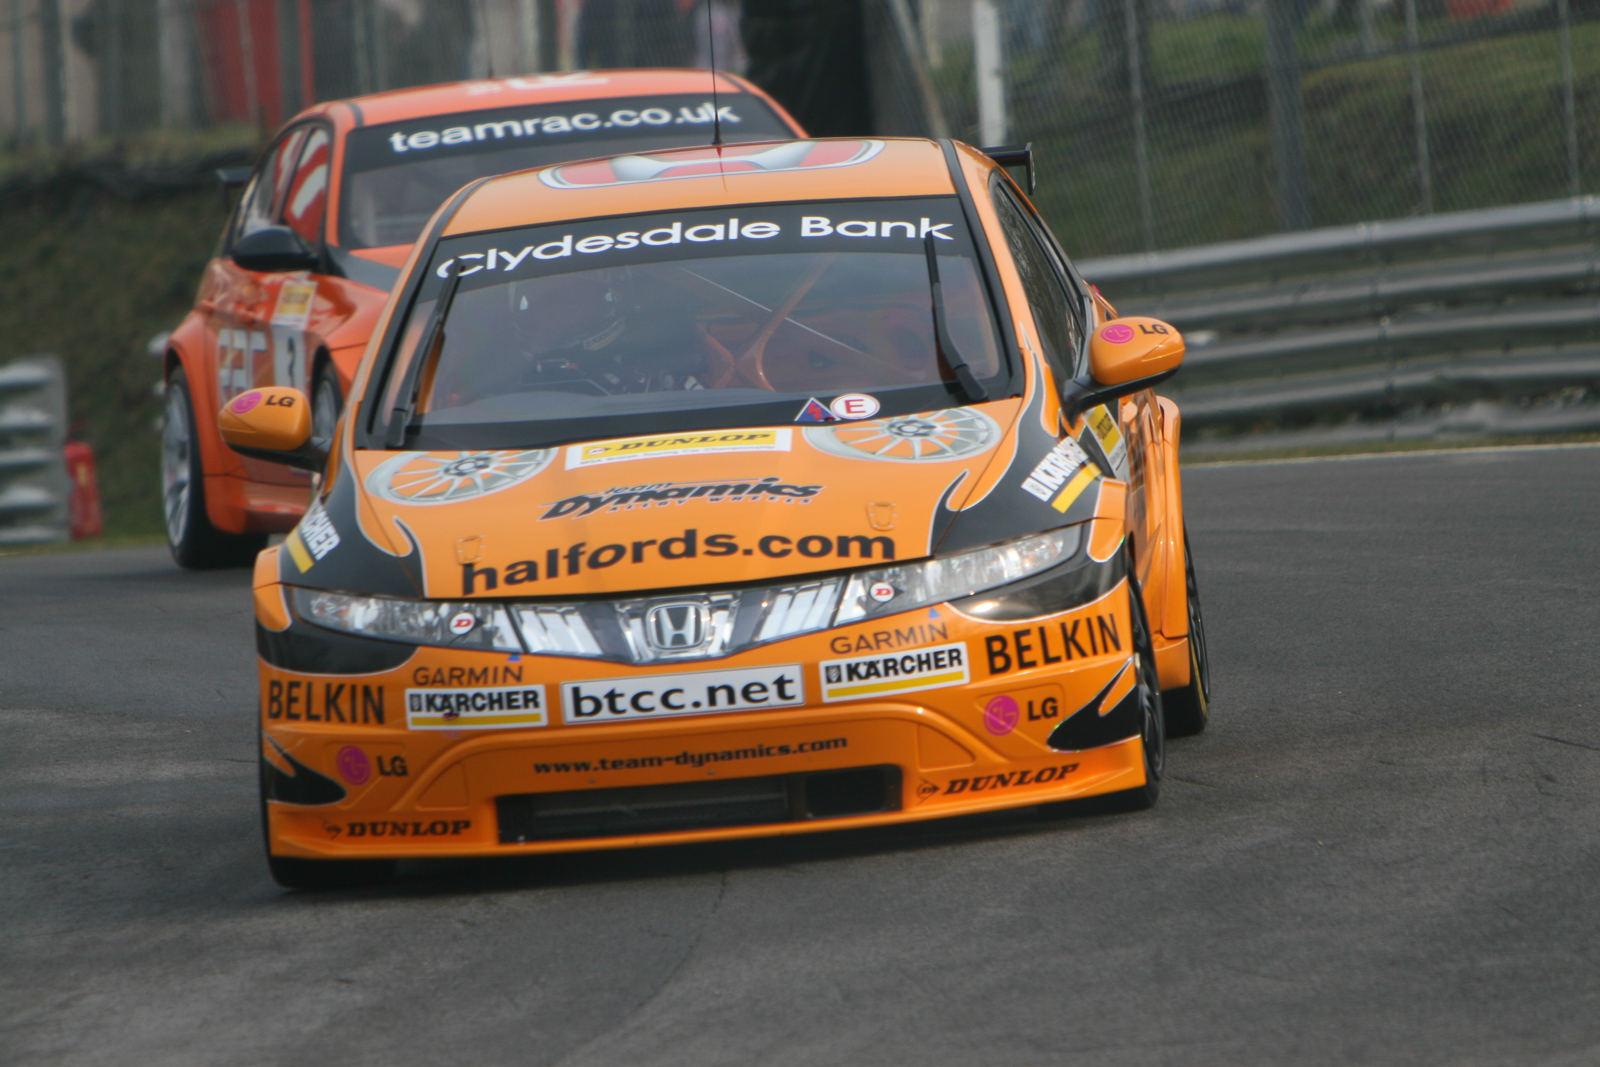 20070331 - BTCC Brands -070331 -002